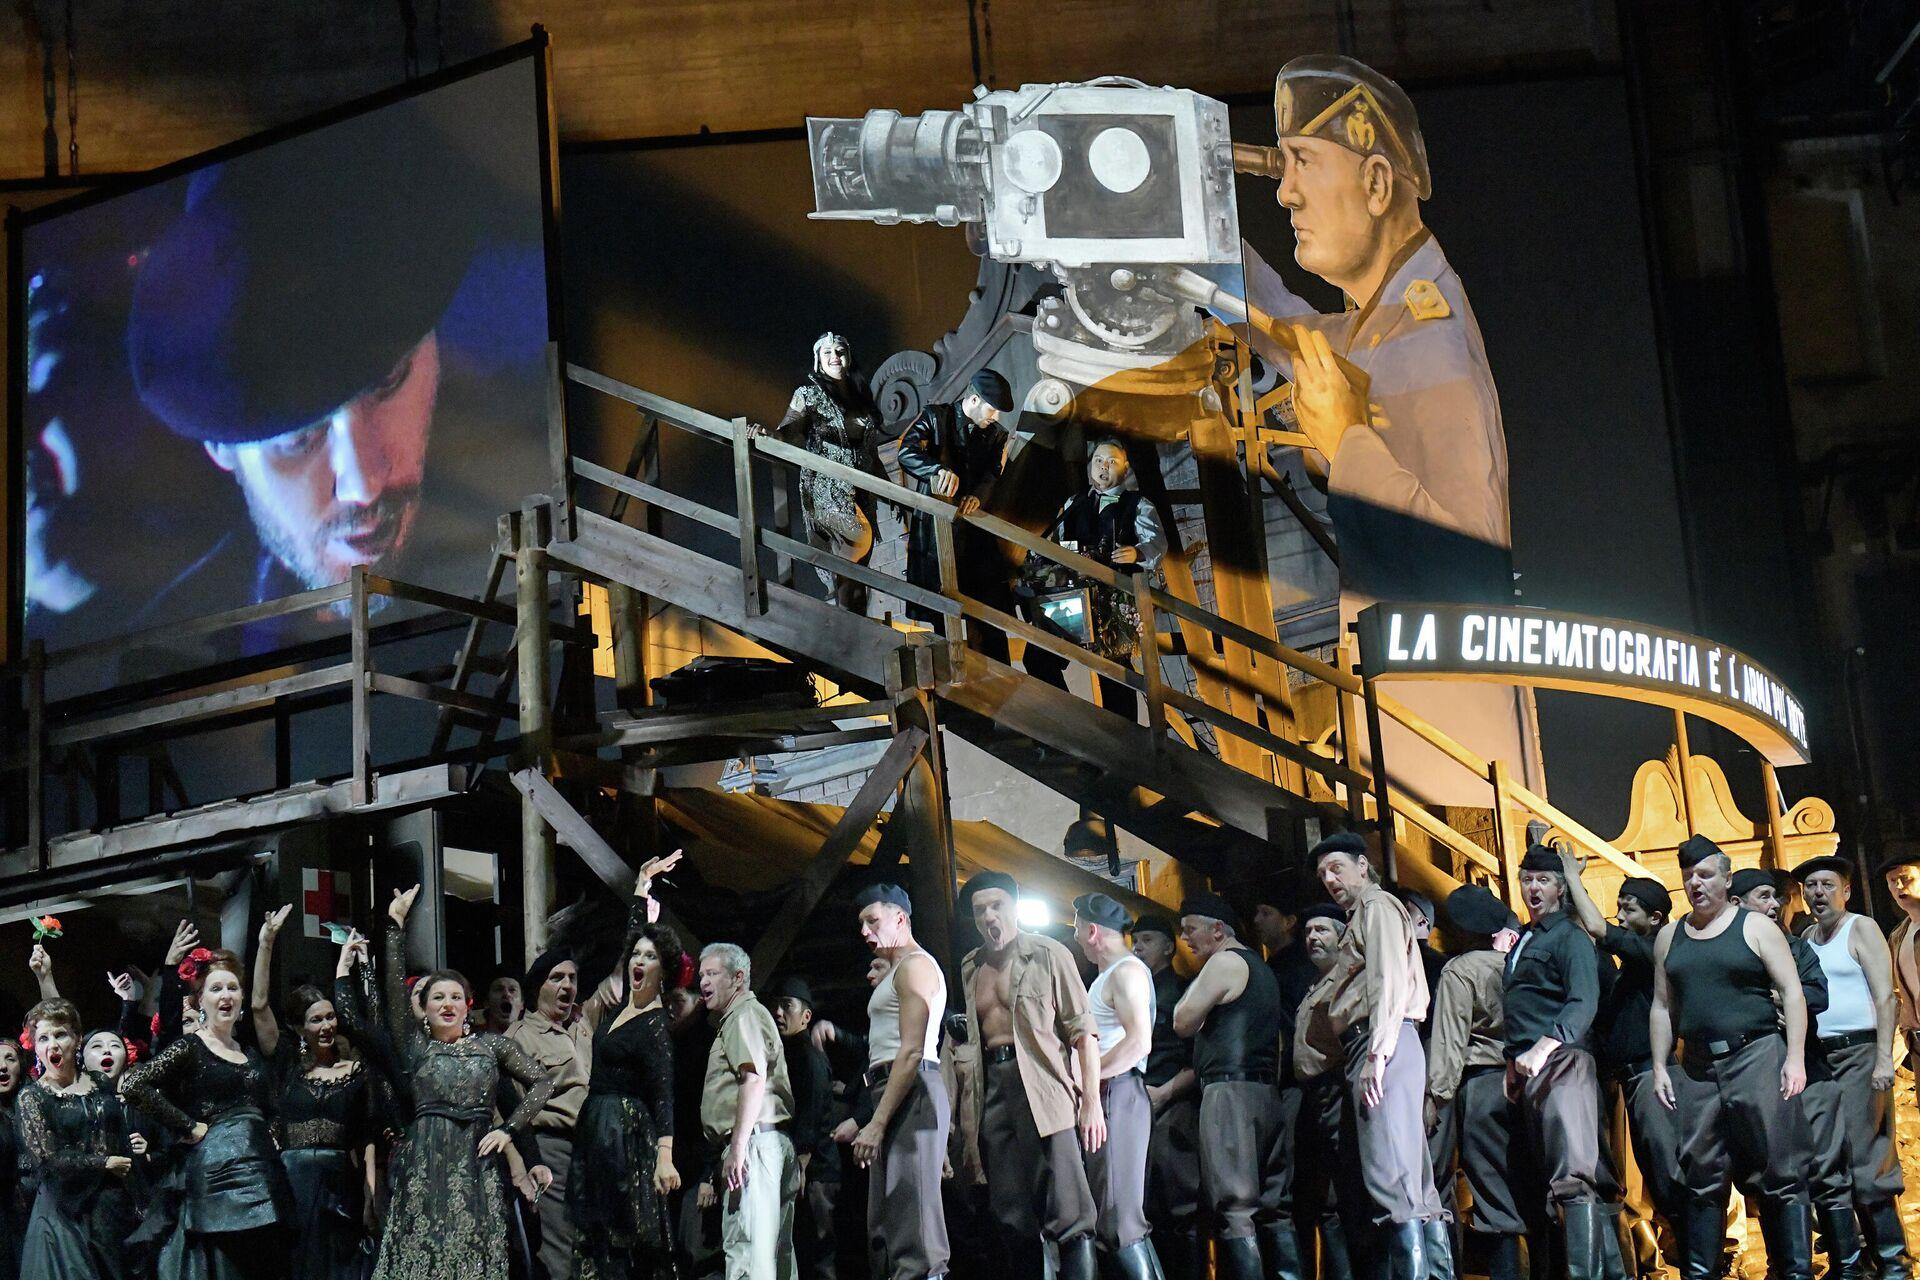 La forza del destino von Giuseppe Verdi, Regie: Frank Castorf - SNA, 1920, 25.01.2021